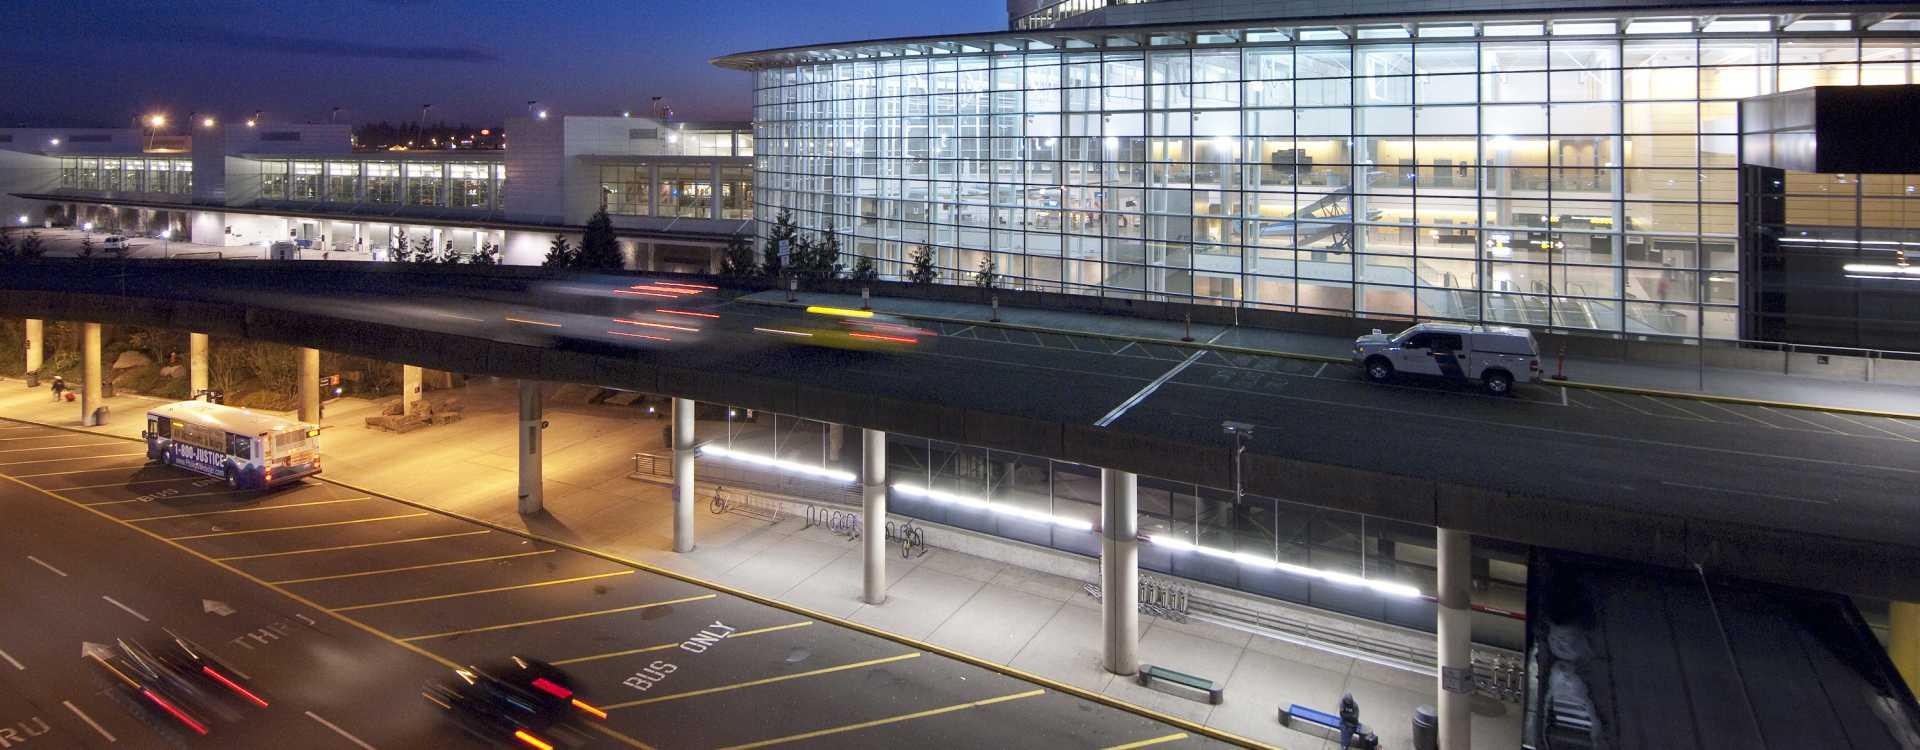 Sea-Tac International Airport